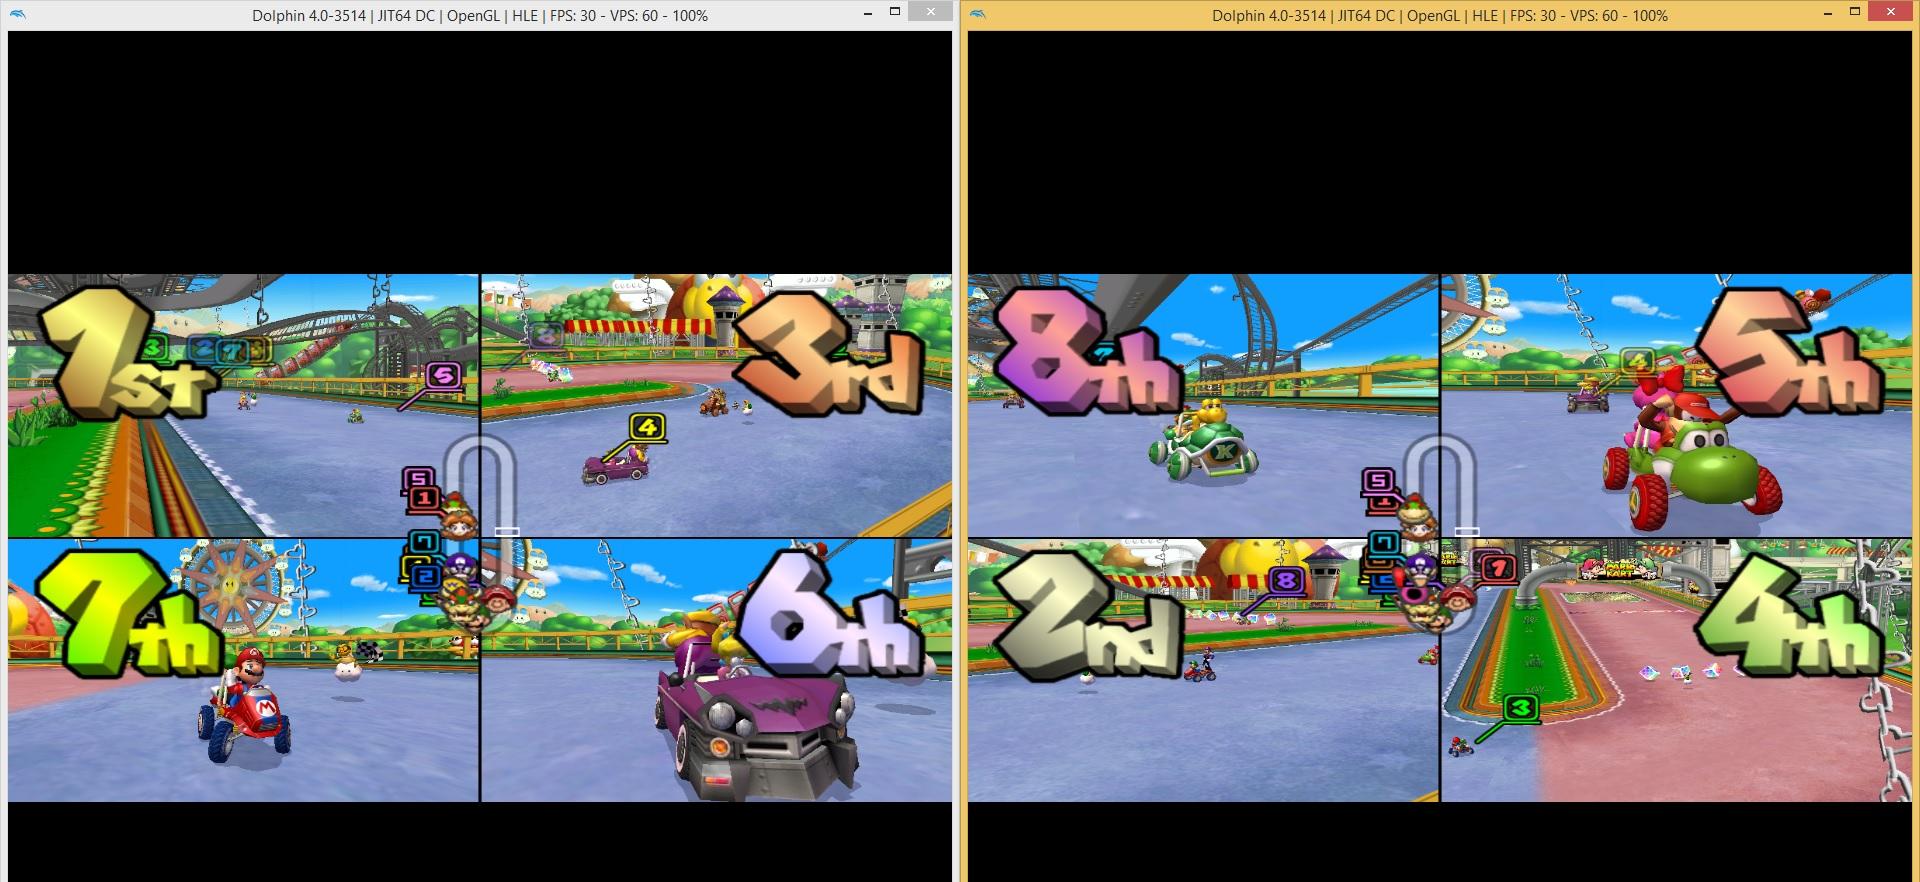 How to play mario kart double dash on dolphin | Mario Kart: Double